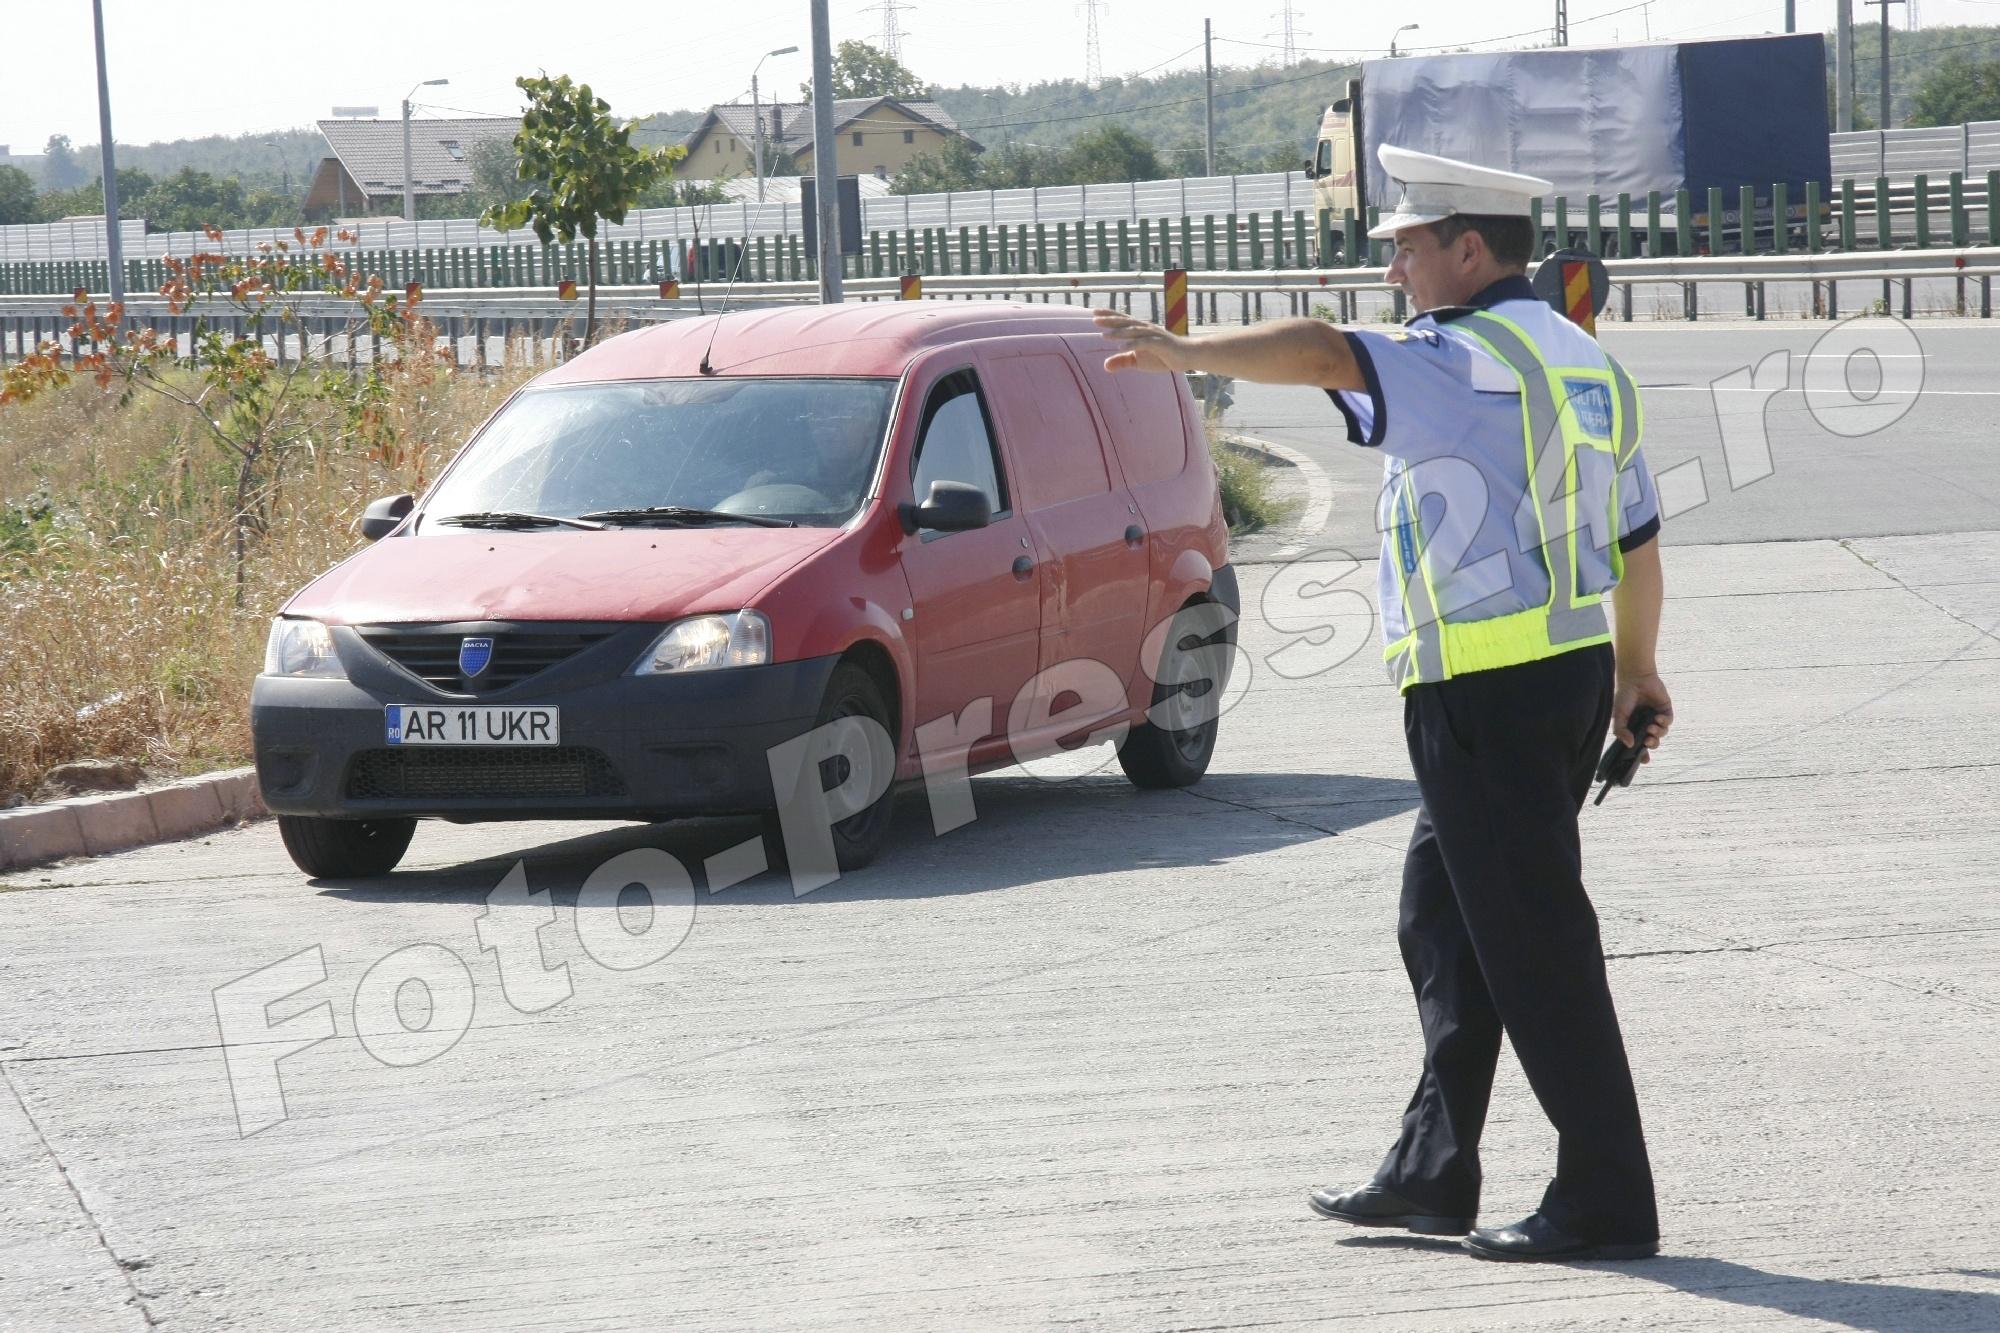 actiune_politie arges (1)